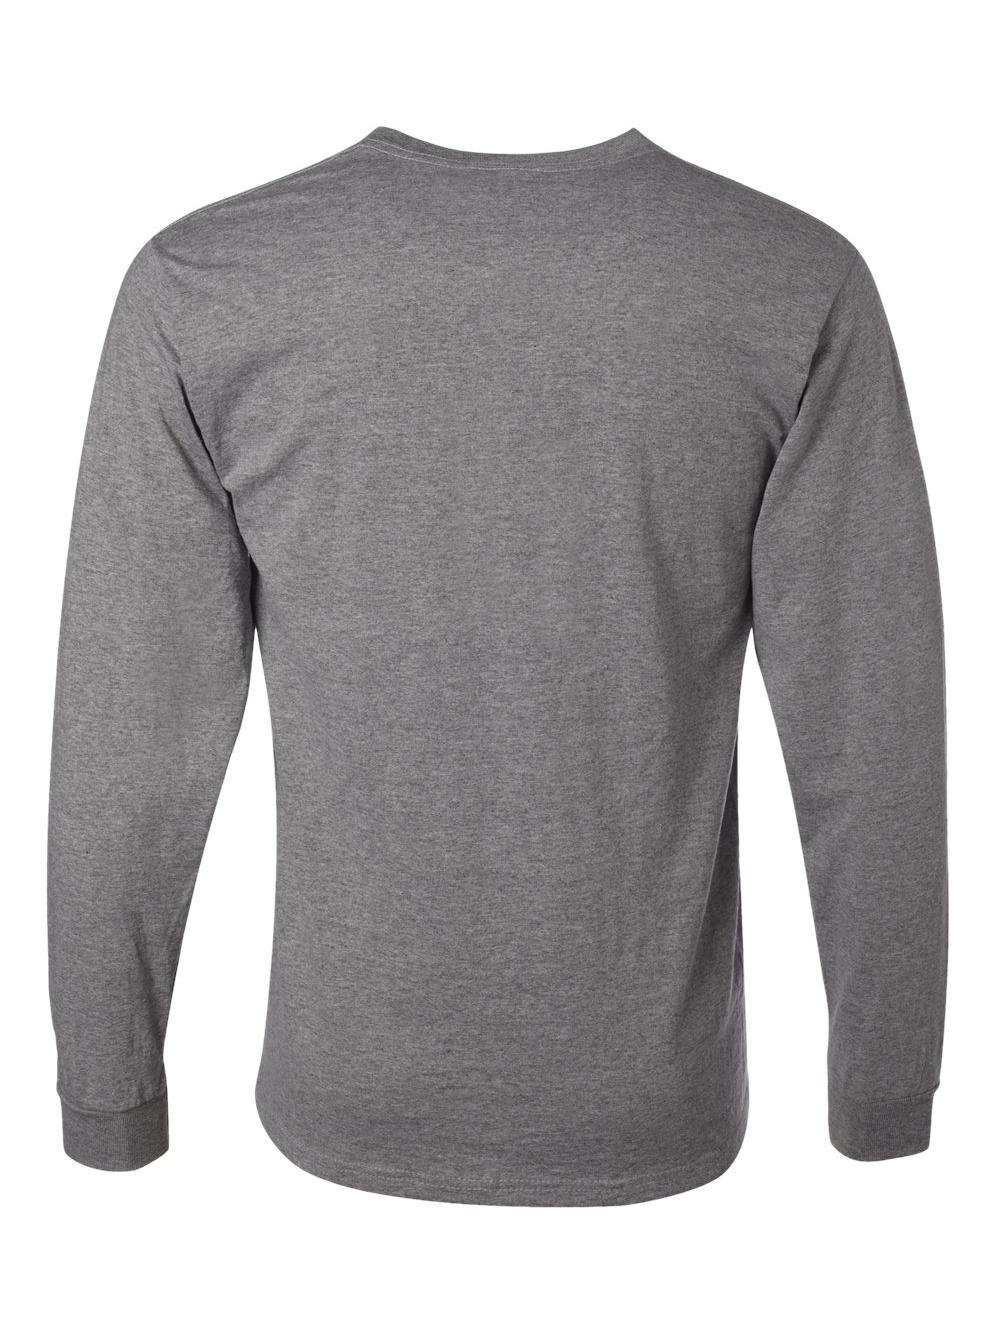 Jerzees-Dri-Power-Long-Sleeve-50-50-T-Shirt-29LSR thumbnail 67